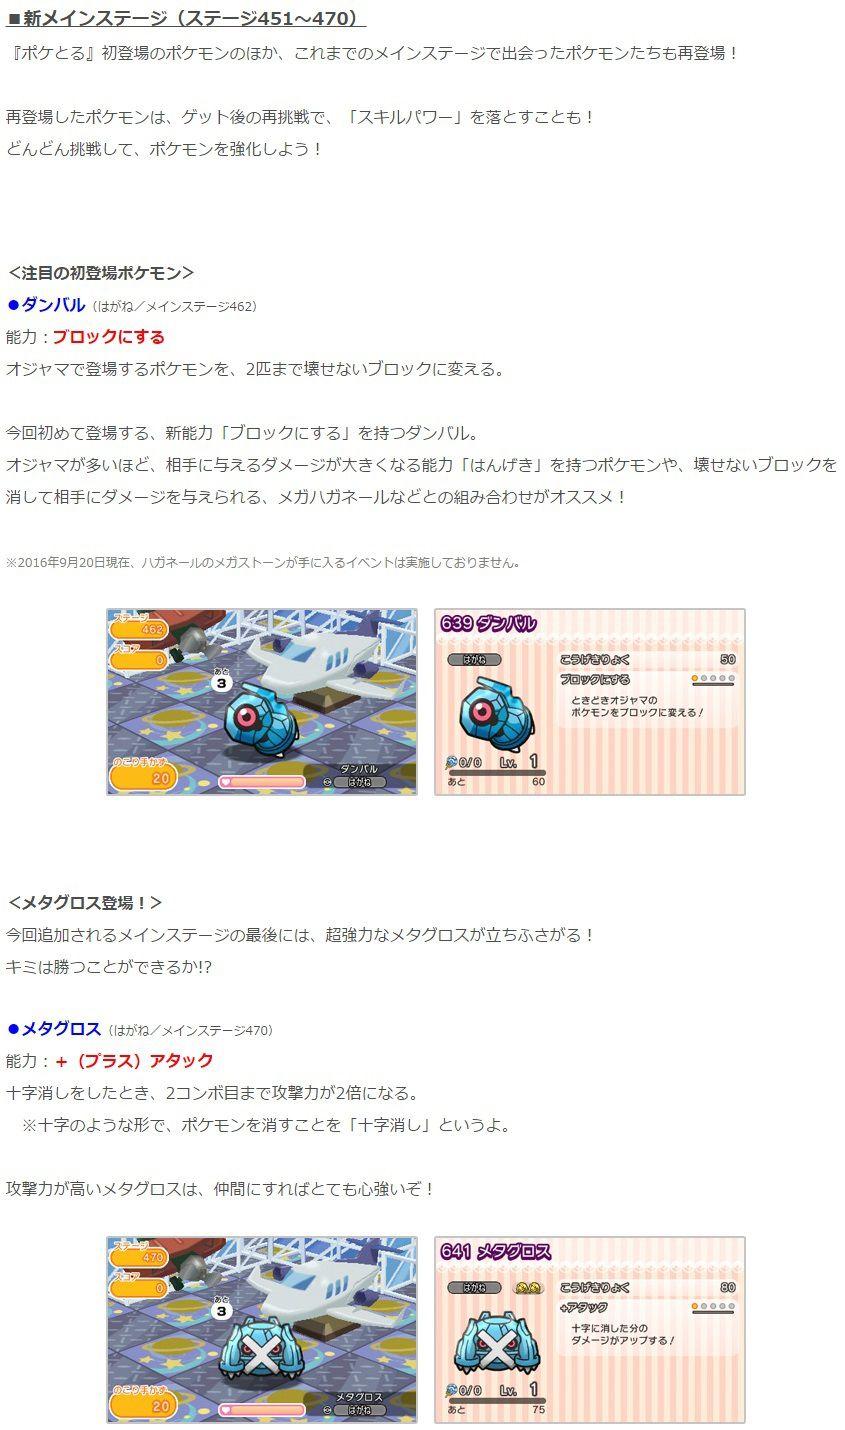 image_6493.jpg